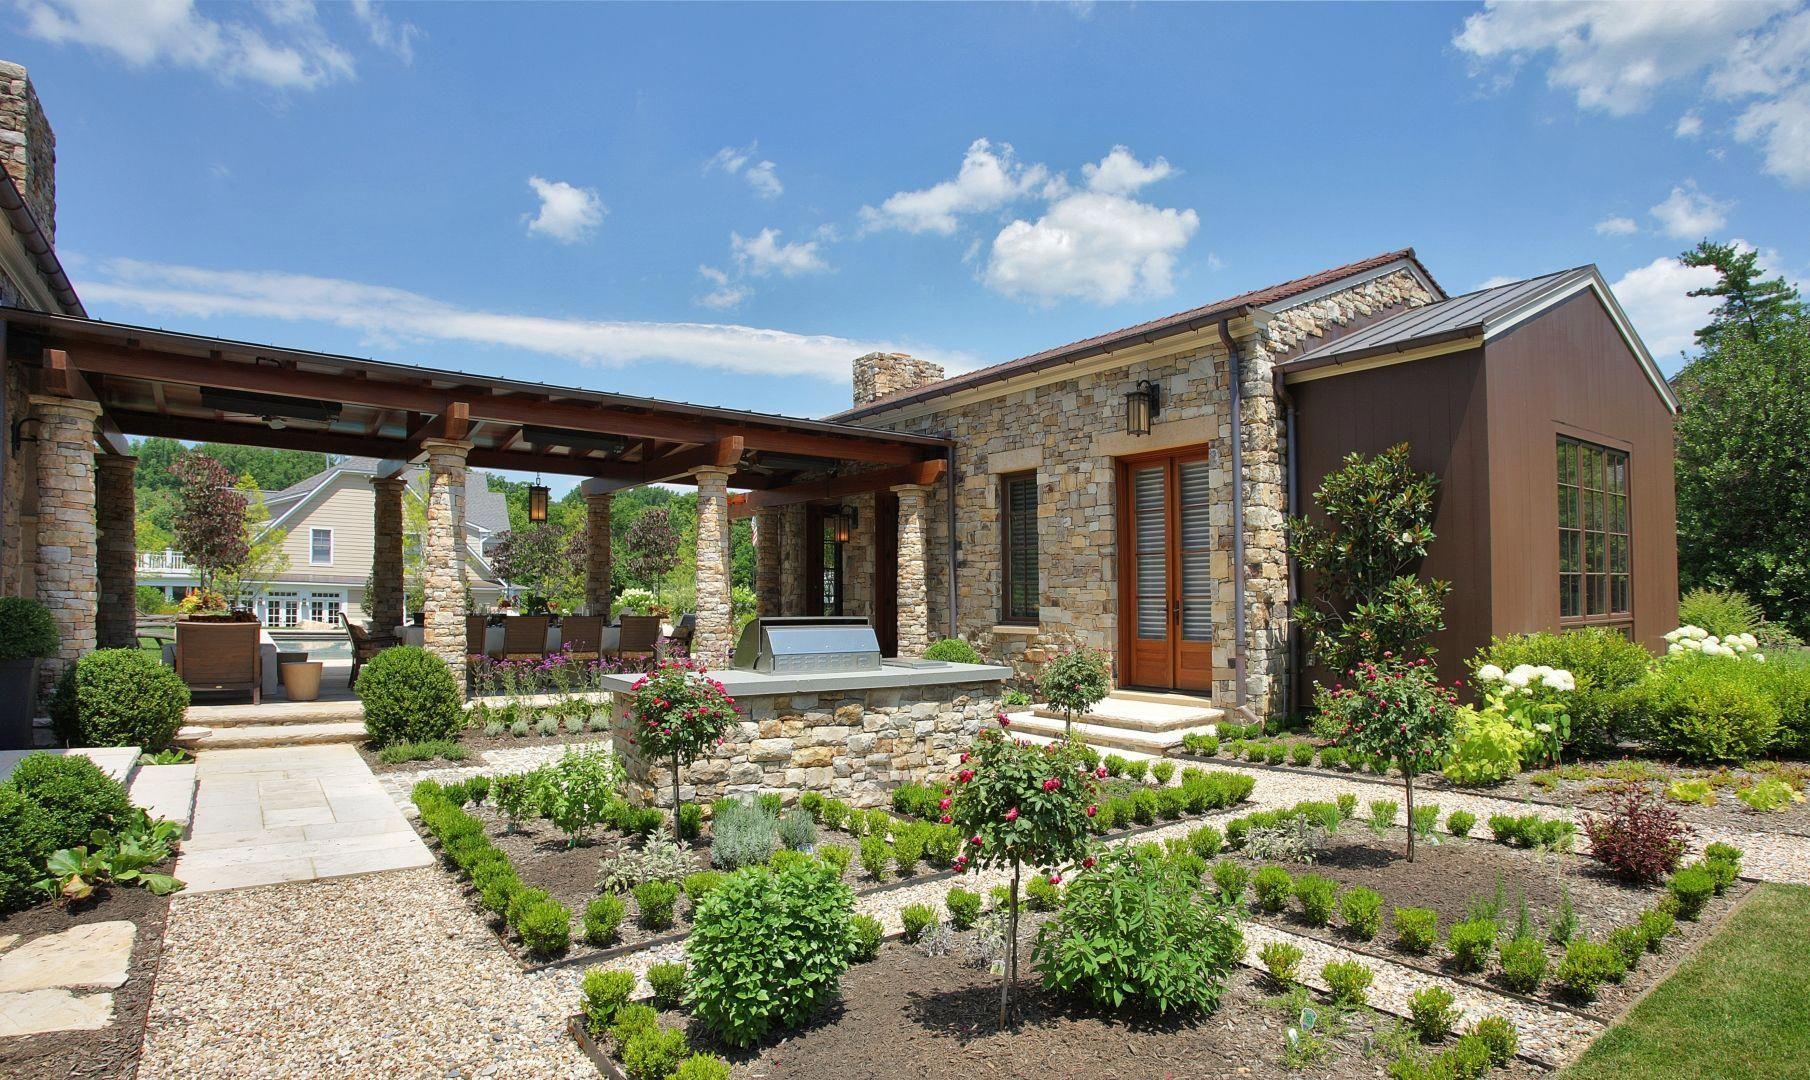 Spanish Style Homes Las Vegas Spanishstylehomes Backyard Guest Houses Spanish Style Homes Mediterranean House Plans